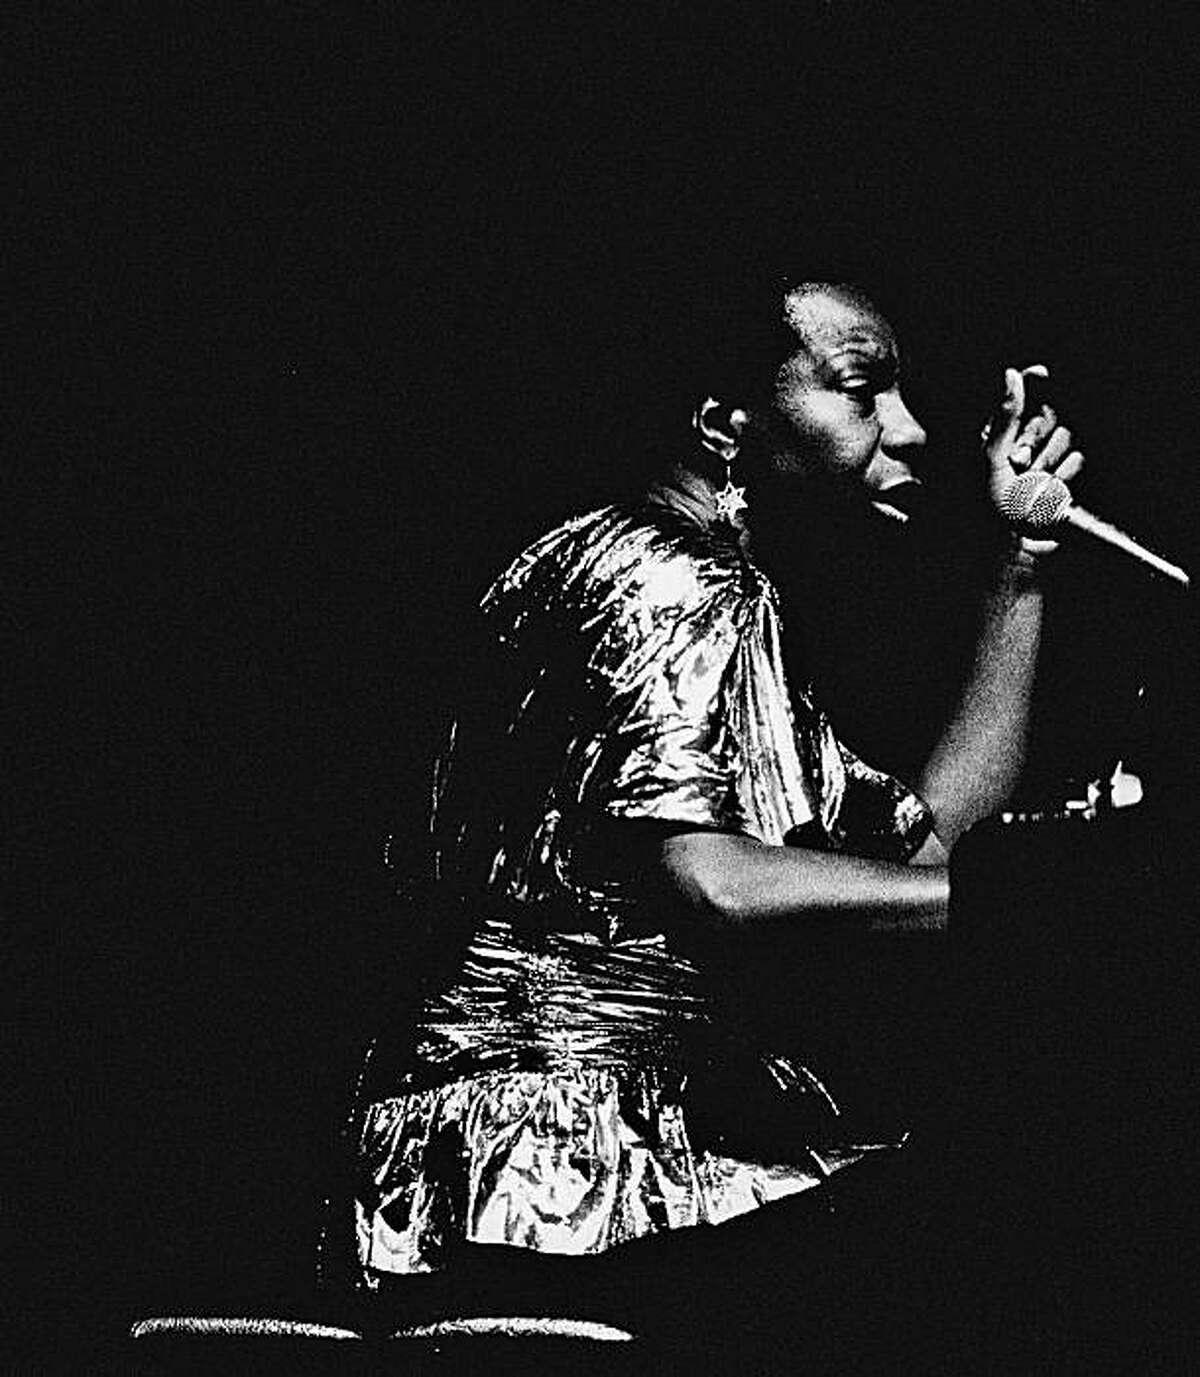 SIMONE.jpg July 19,1986 - Nina Simone concert at the Masonic Auditorium i San Francisco, Calif. Frederic Larson Chronicle File